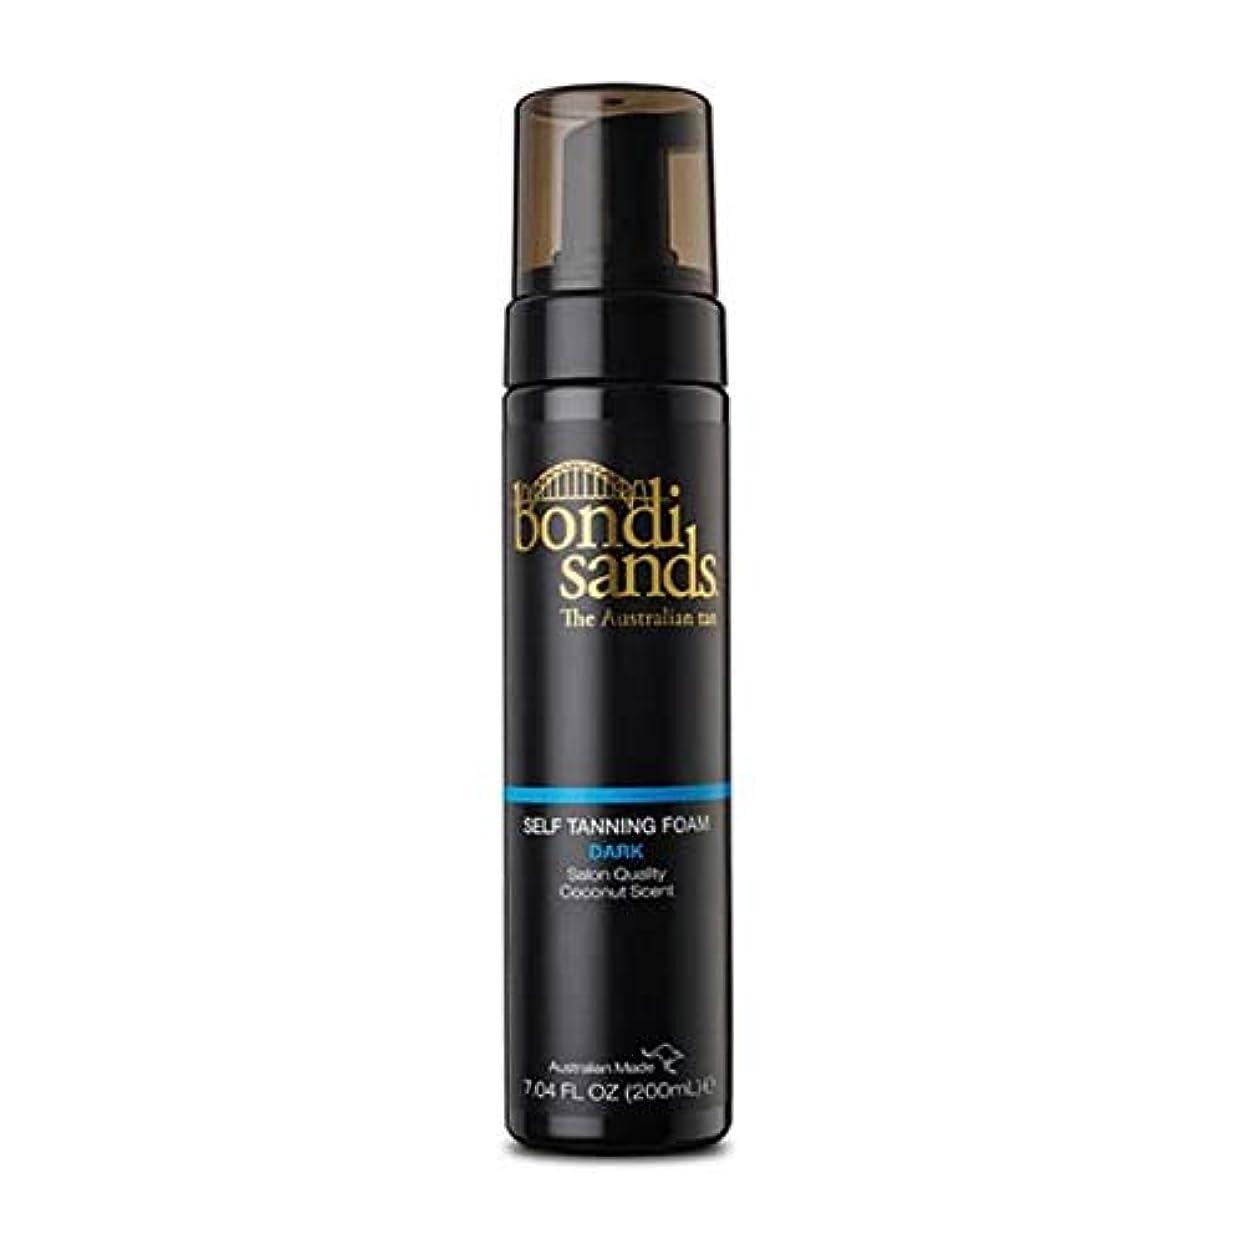 [Bondi Sands ] ボンダイ砂セルフタンニングフォームダーク200ミリリットル - Bondi Sands Self tanning Foam Dark 200ml [並行輸入品]